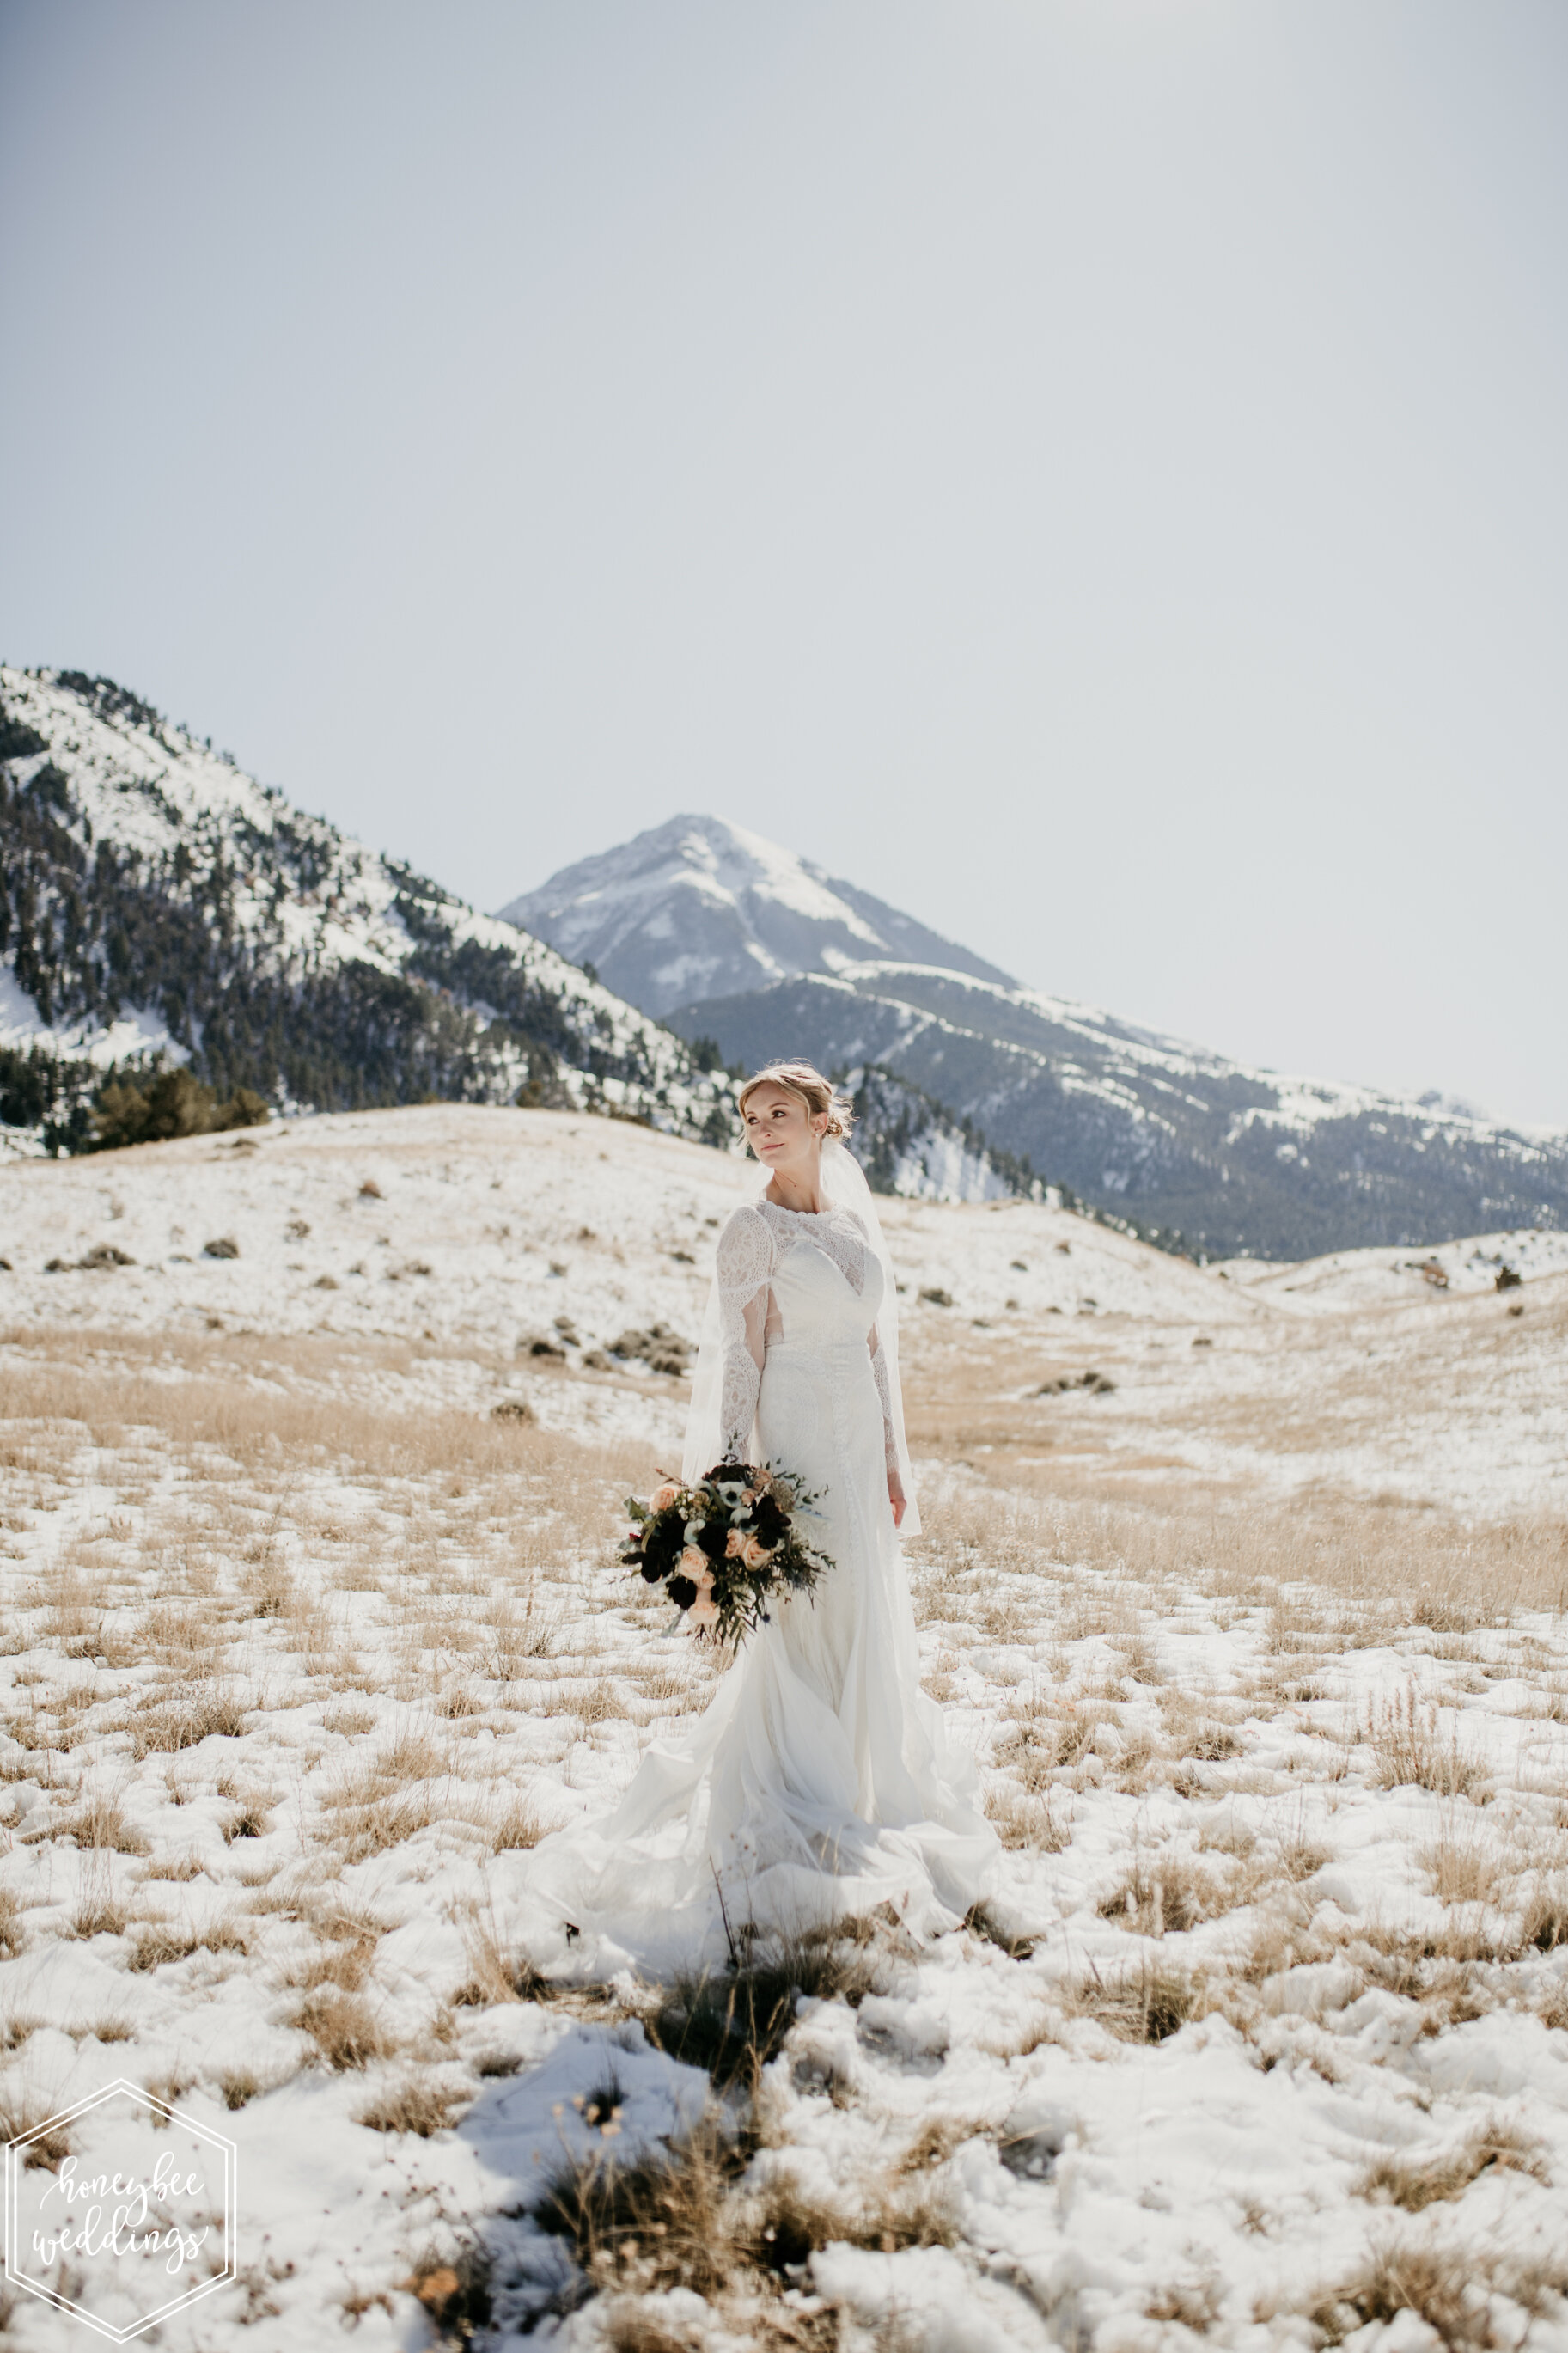 070Chico Hot Springs Wedding_Montana Wedding Photographer_Winter Wedding_Ariel & Richard_October 12, 2019-1238.jpg